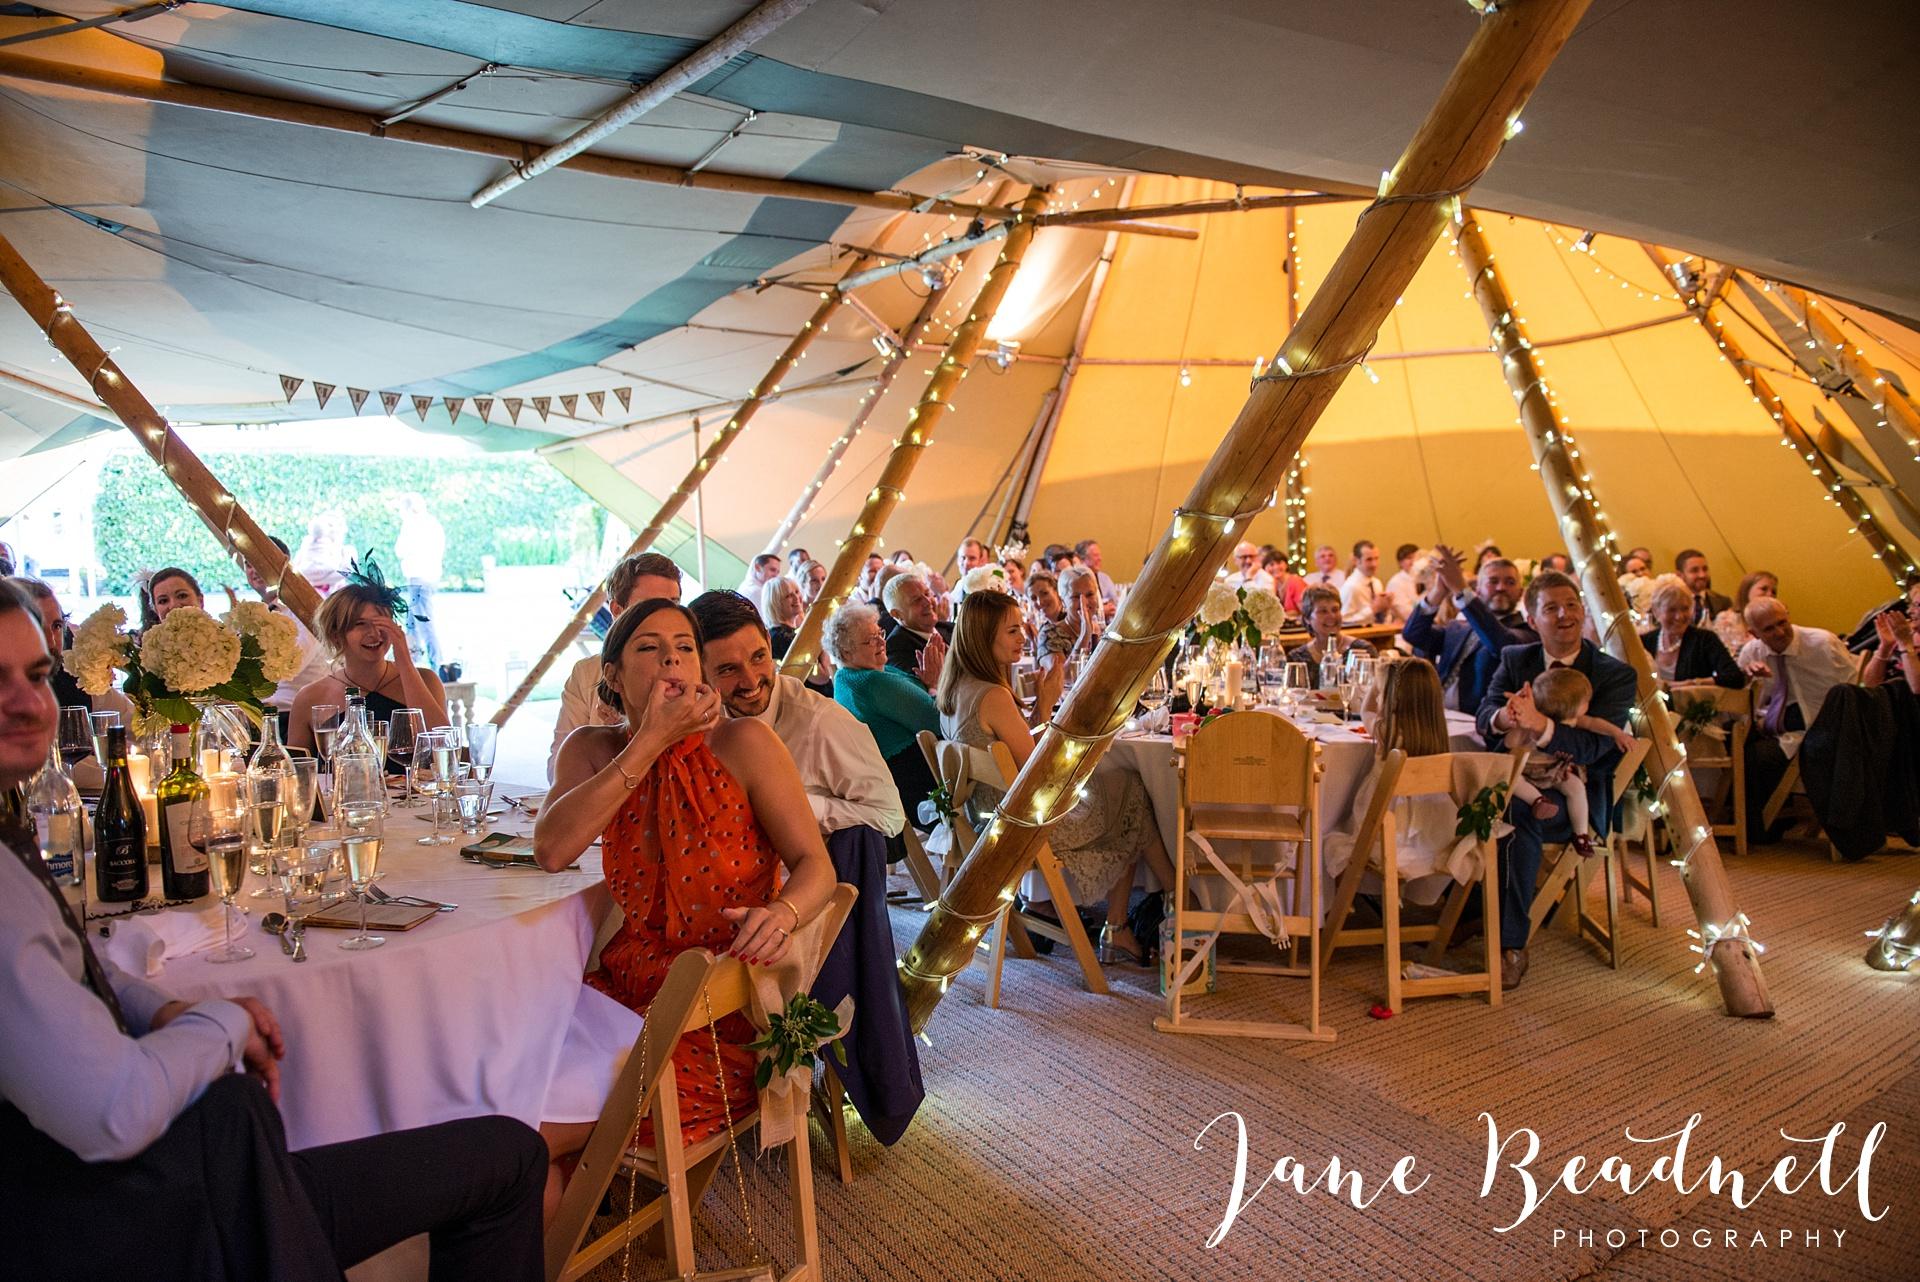 fine-art-wedding-photographer-jane-beadnell-yorkshire-wedding-photographer_0129